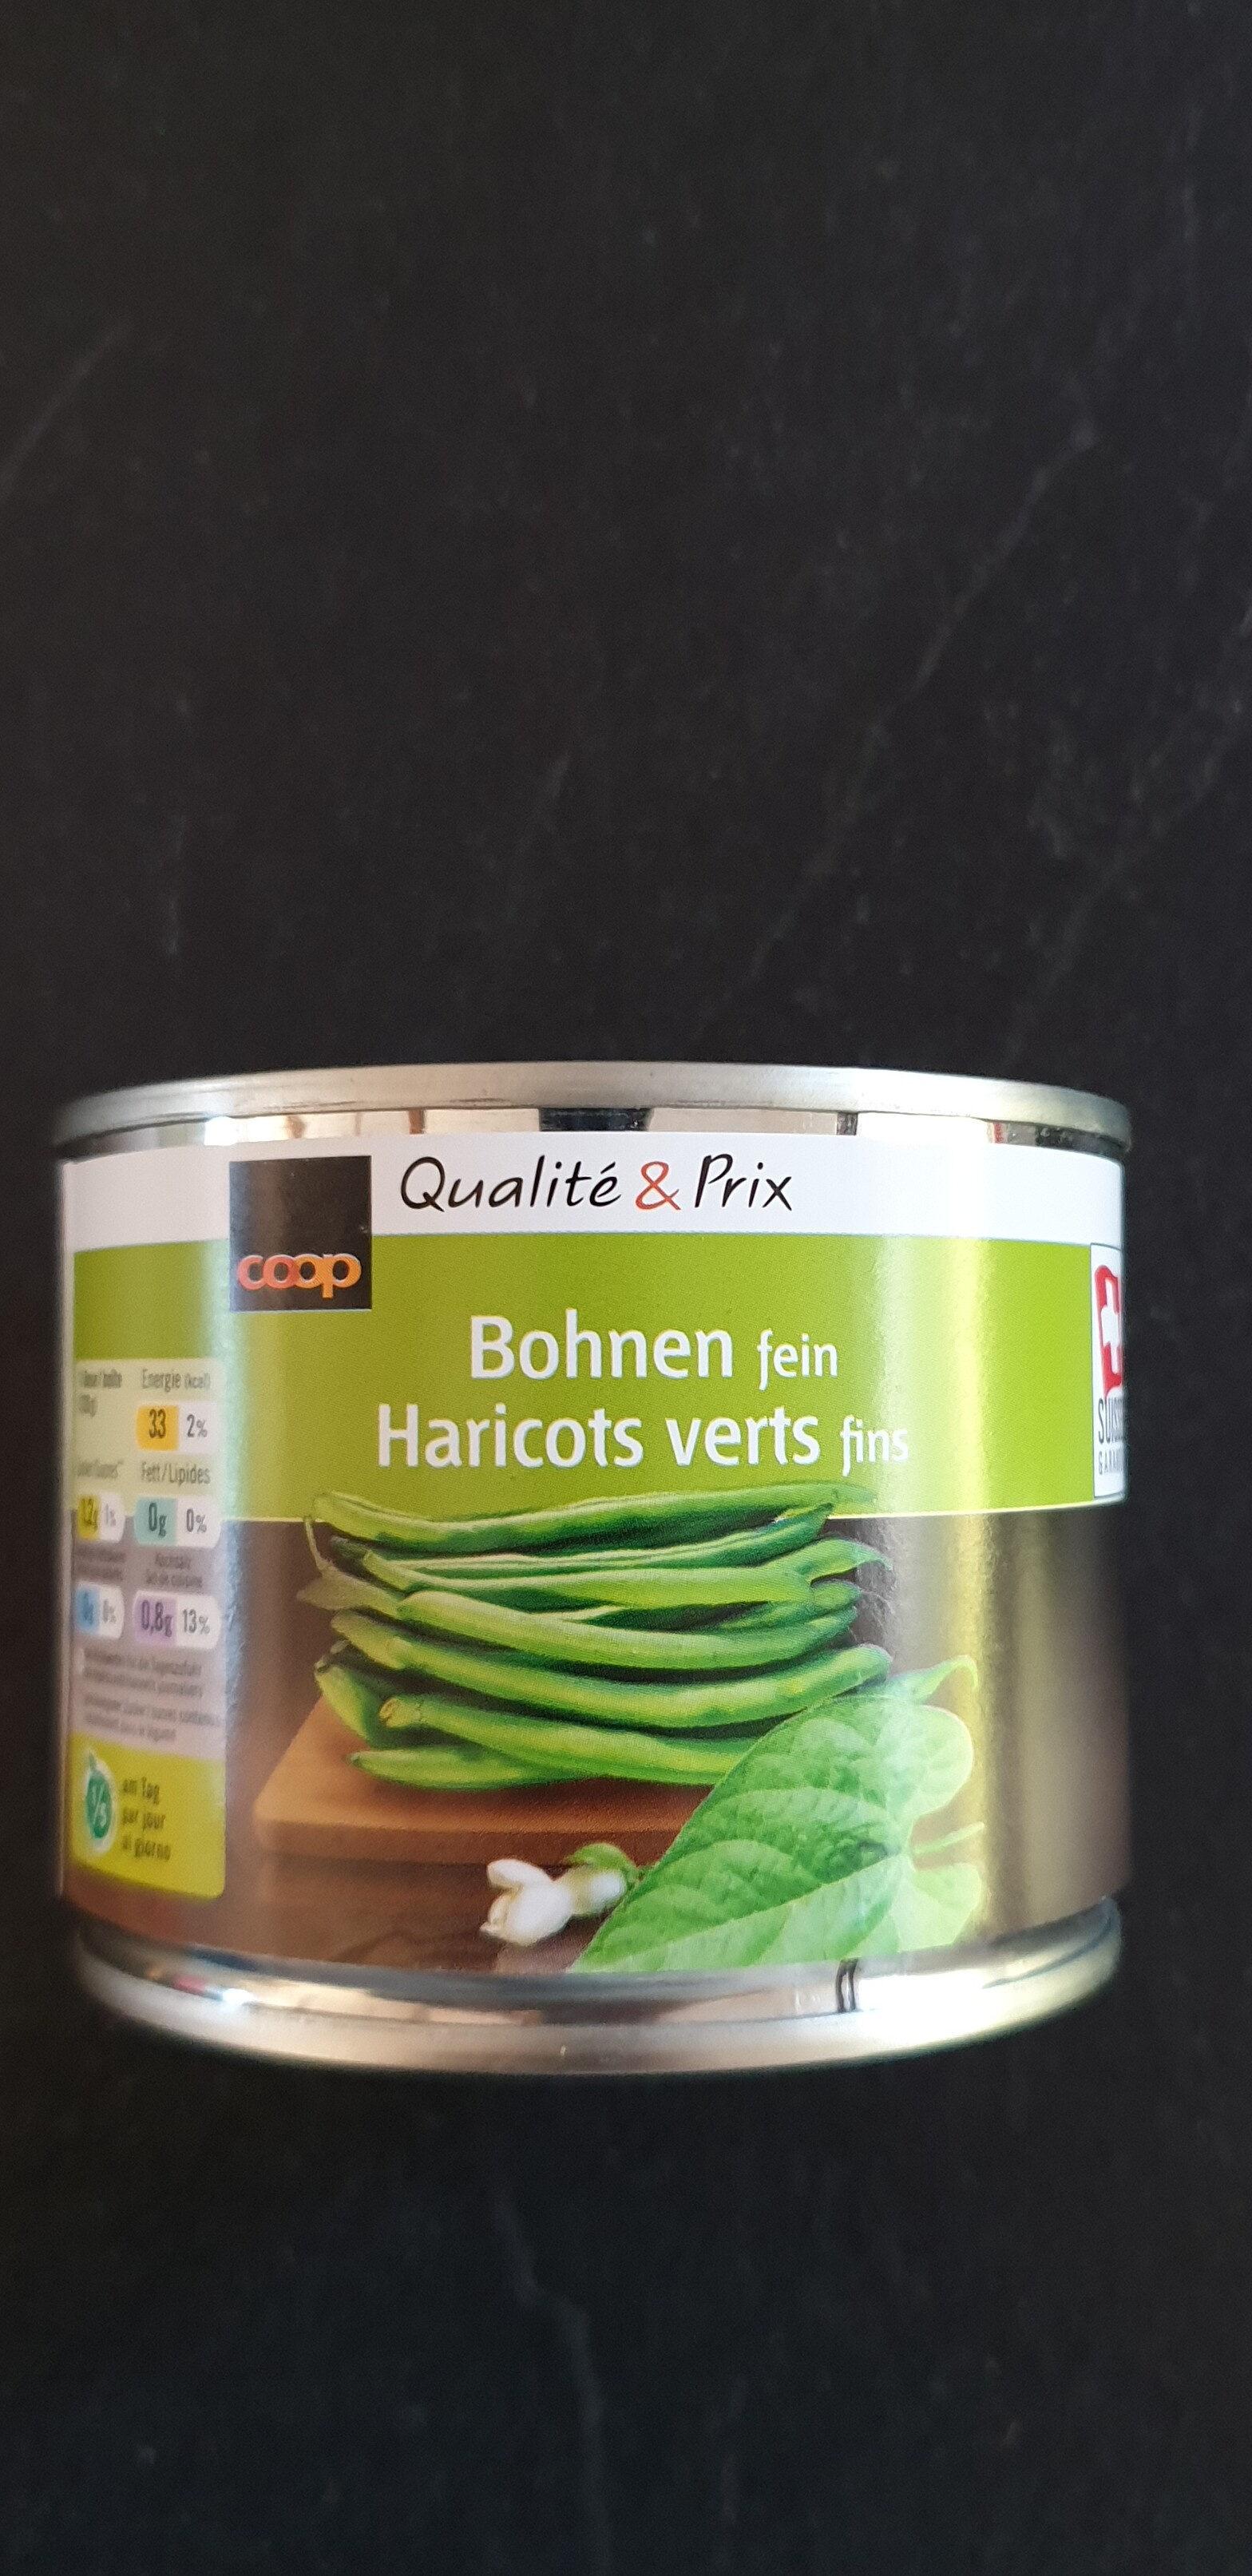 Haricots verts fins - Prodotto - fr